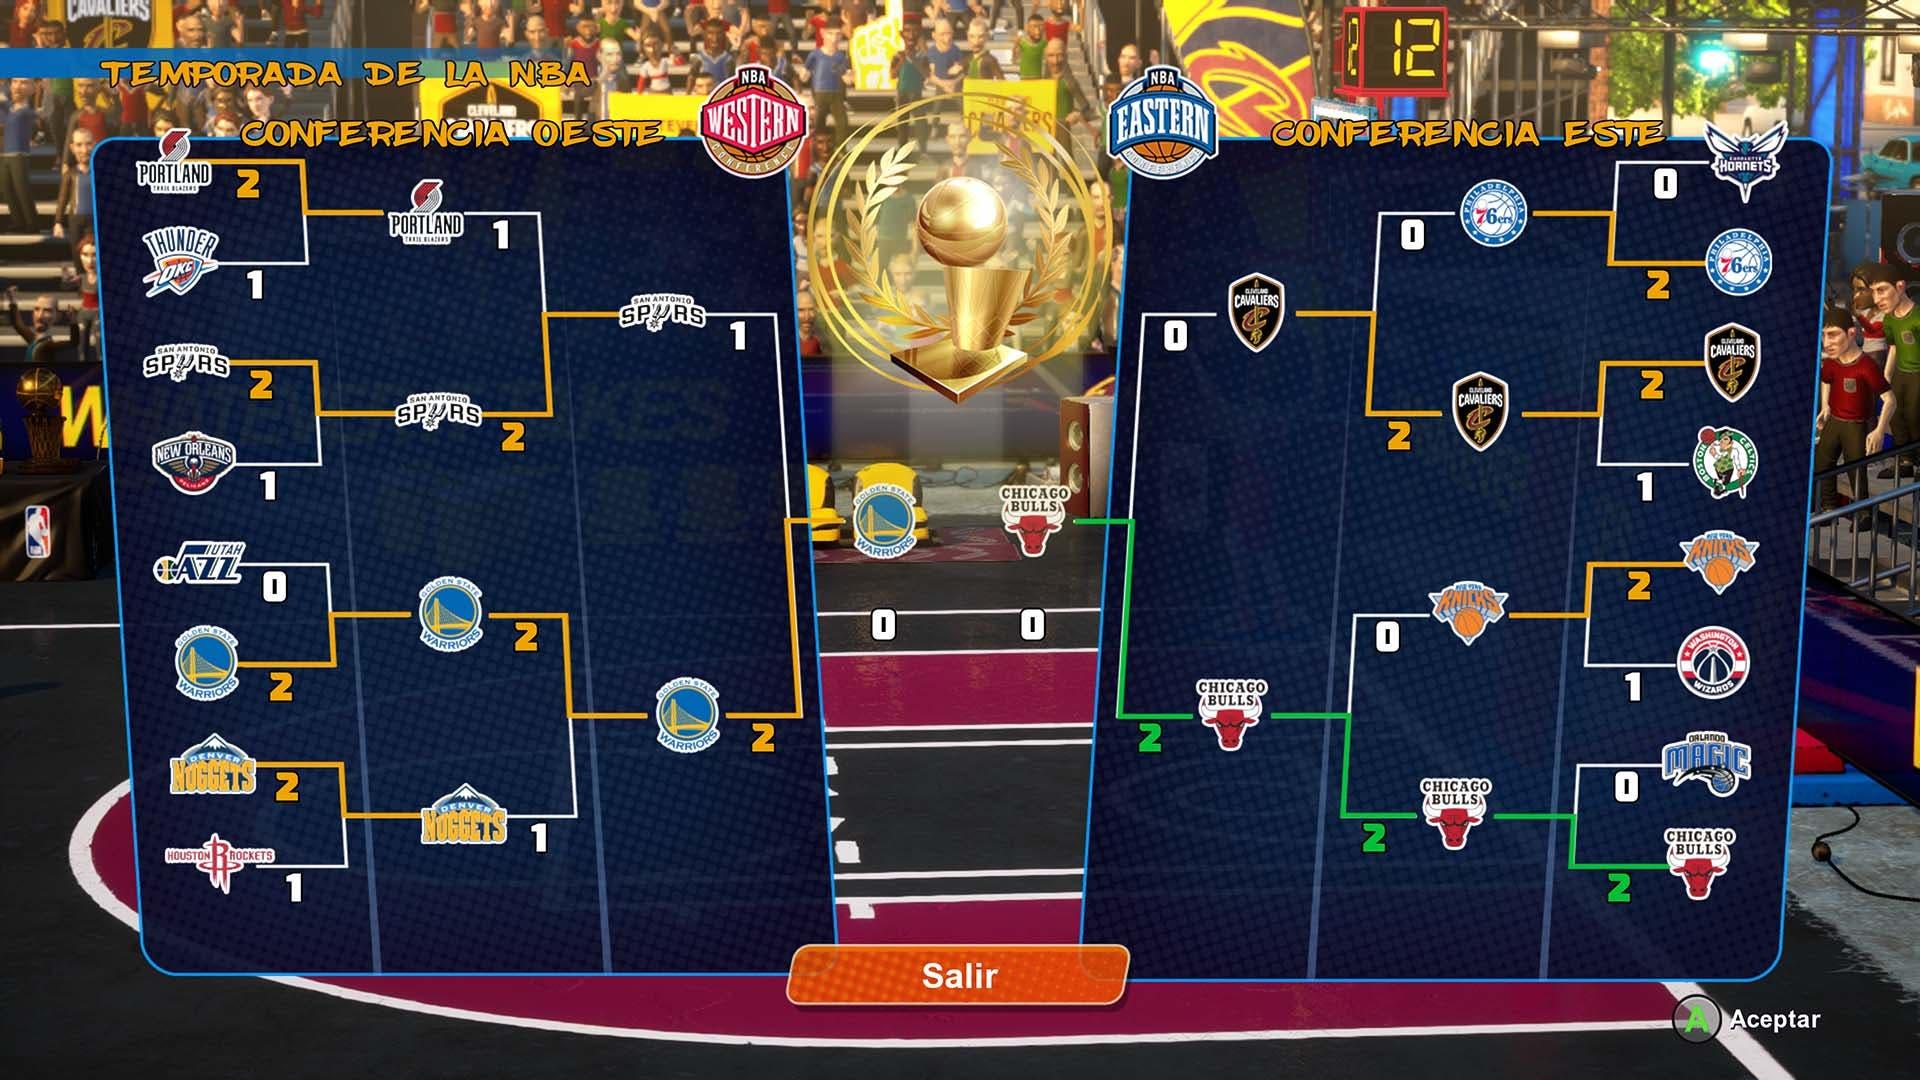 Análisis de NBA Playgrounds 2 - Xbox One 8